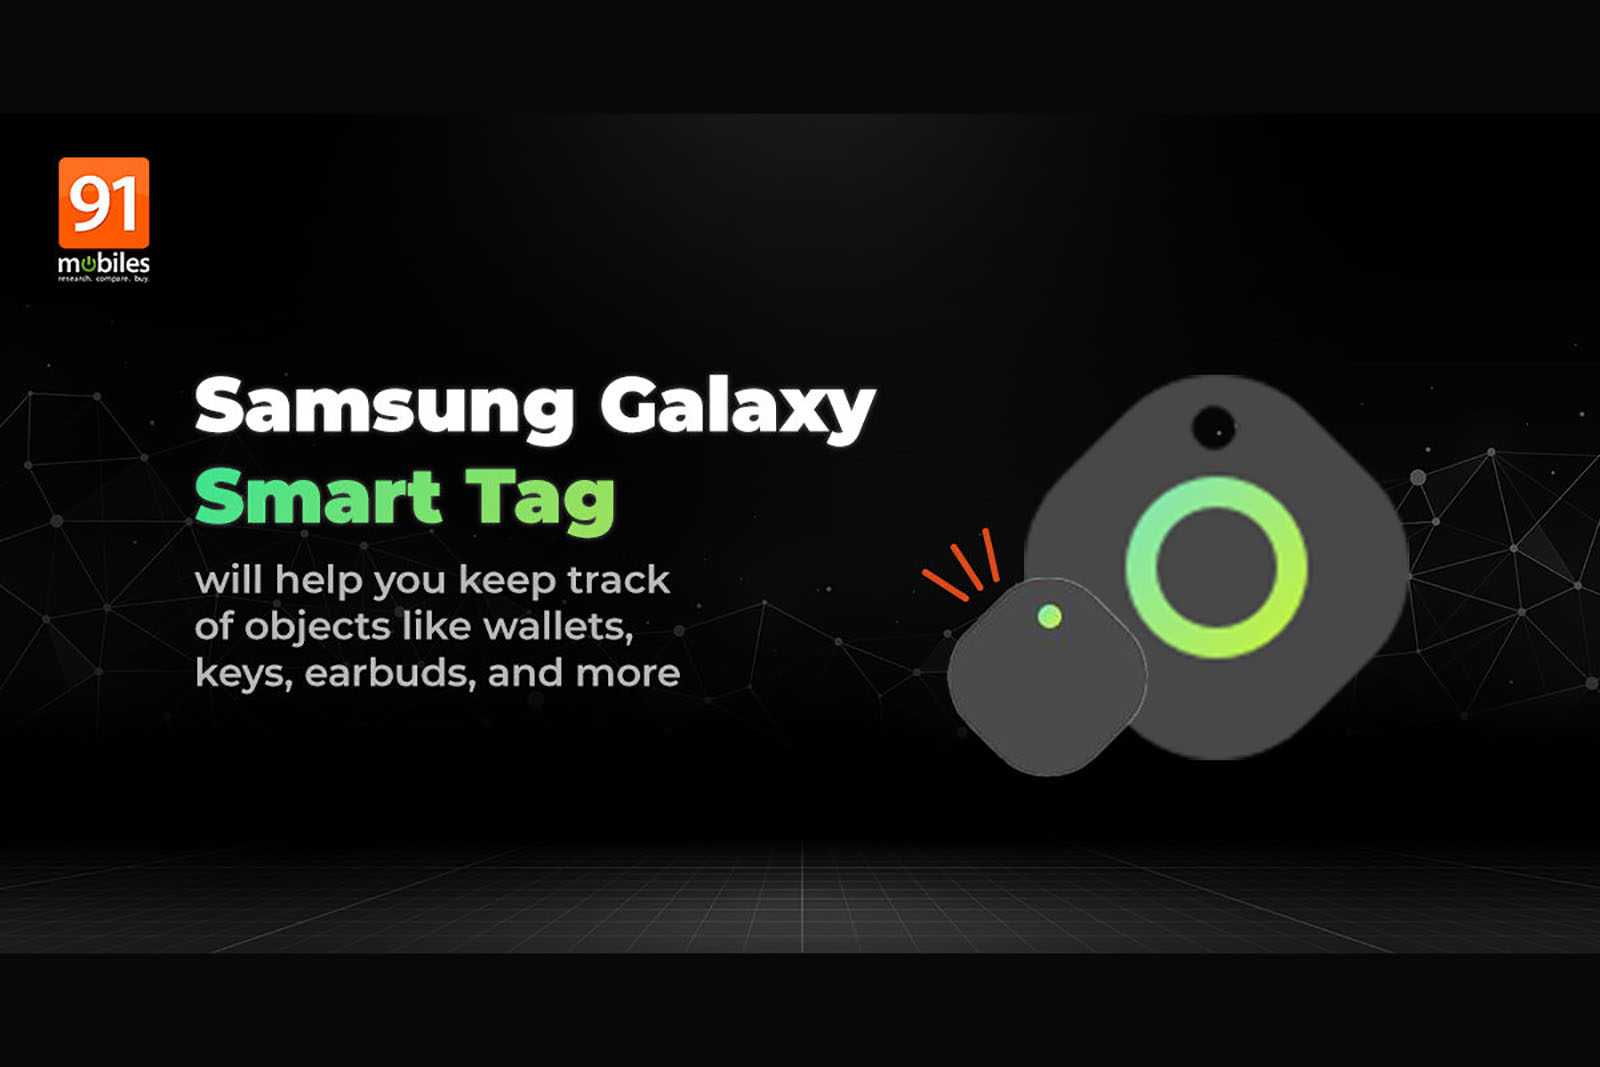 Galaxy Smart Tag